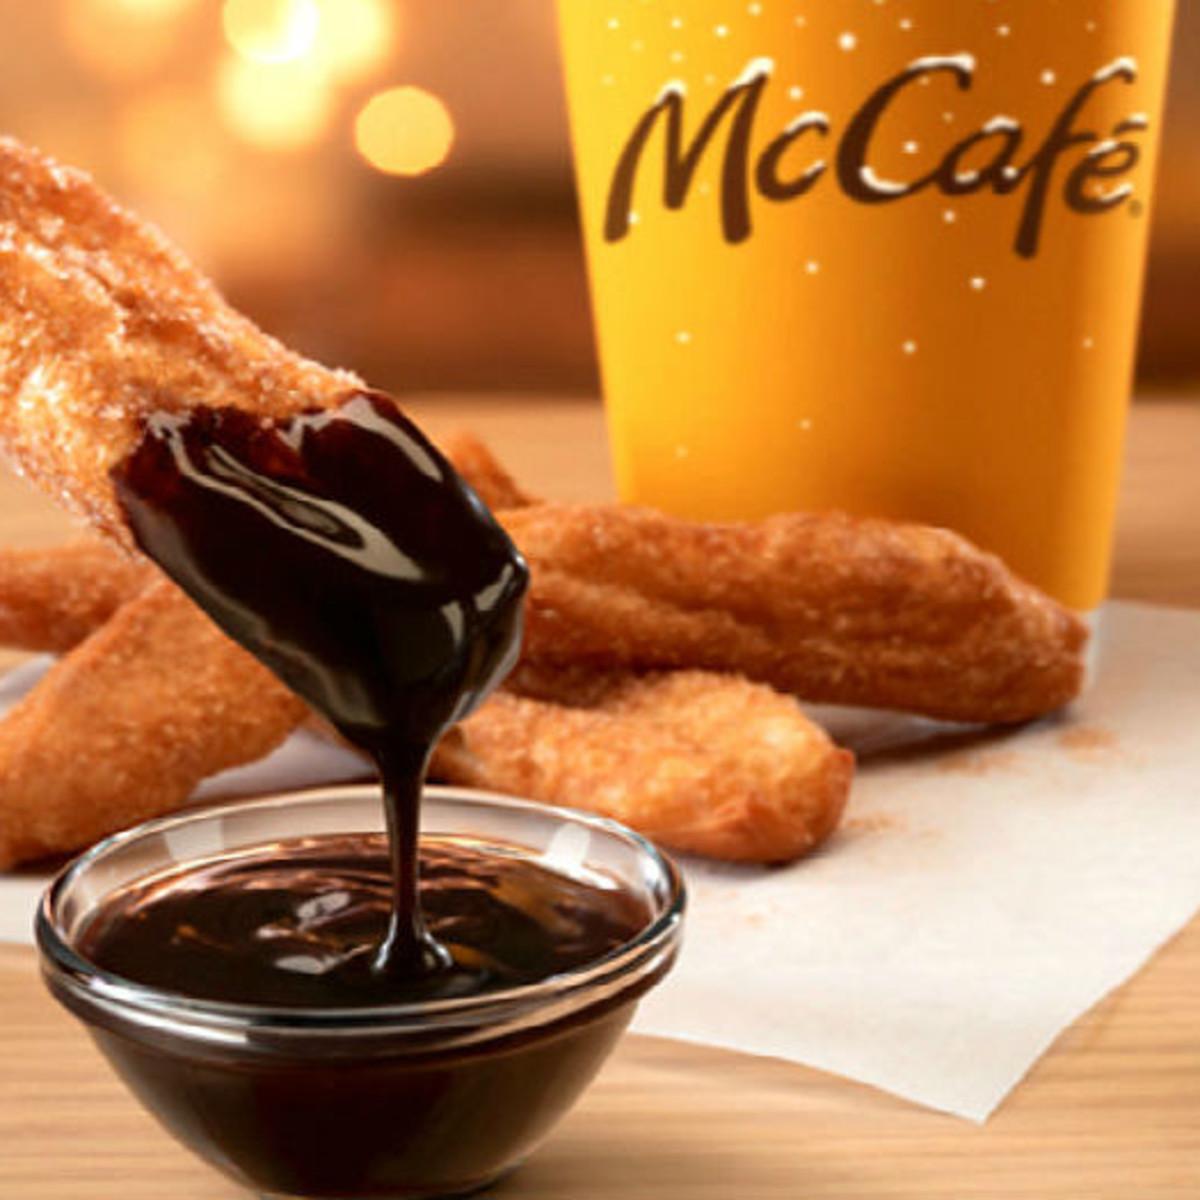 Drive-thru Gourmet - McDonald's donut sticks